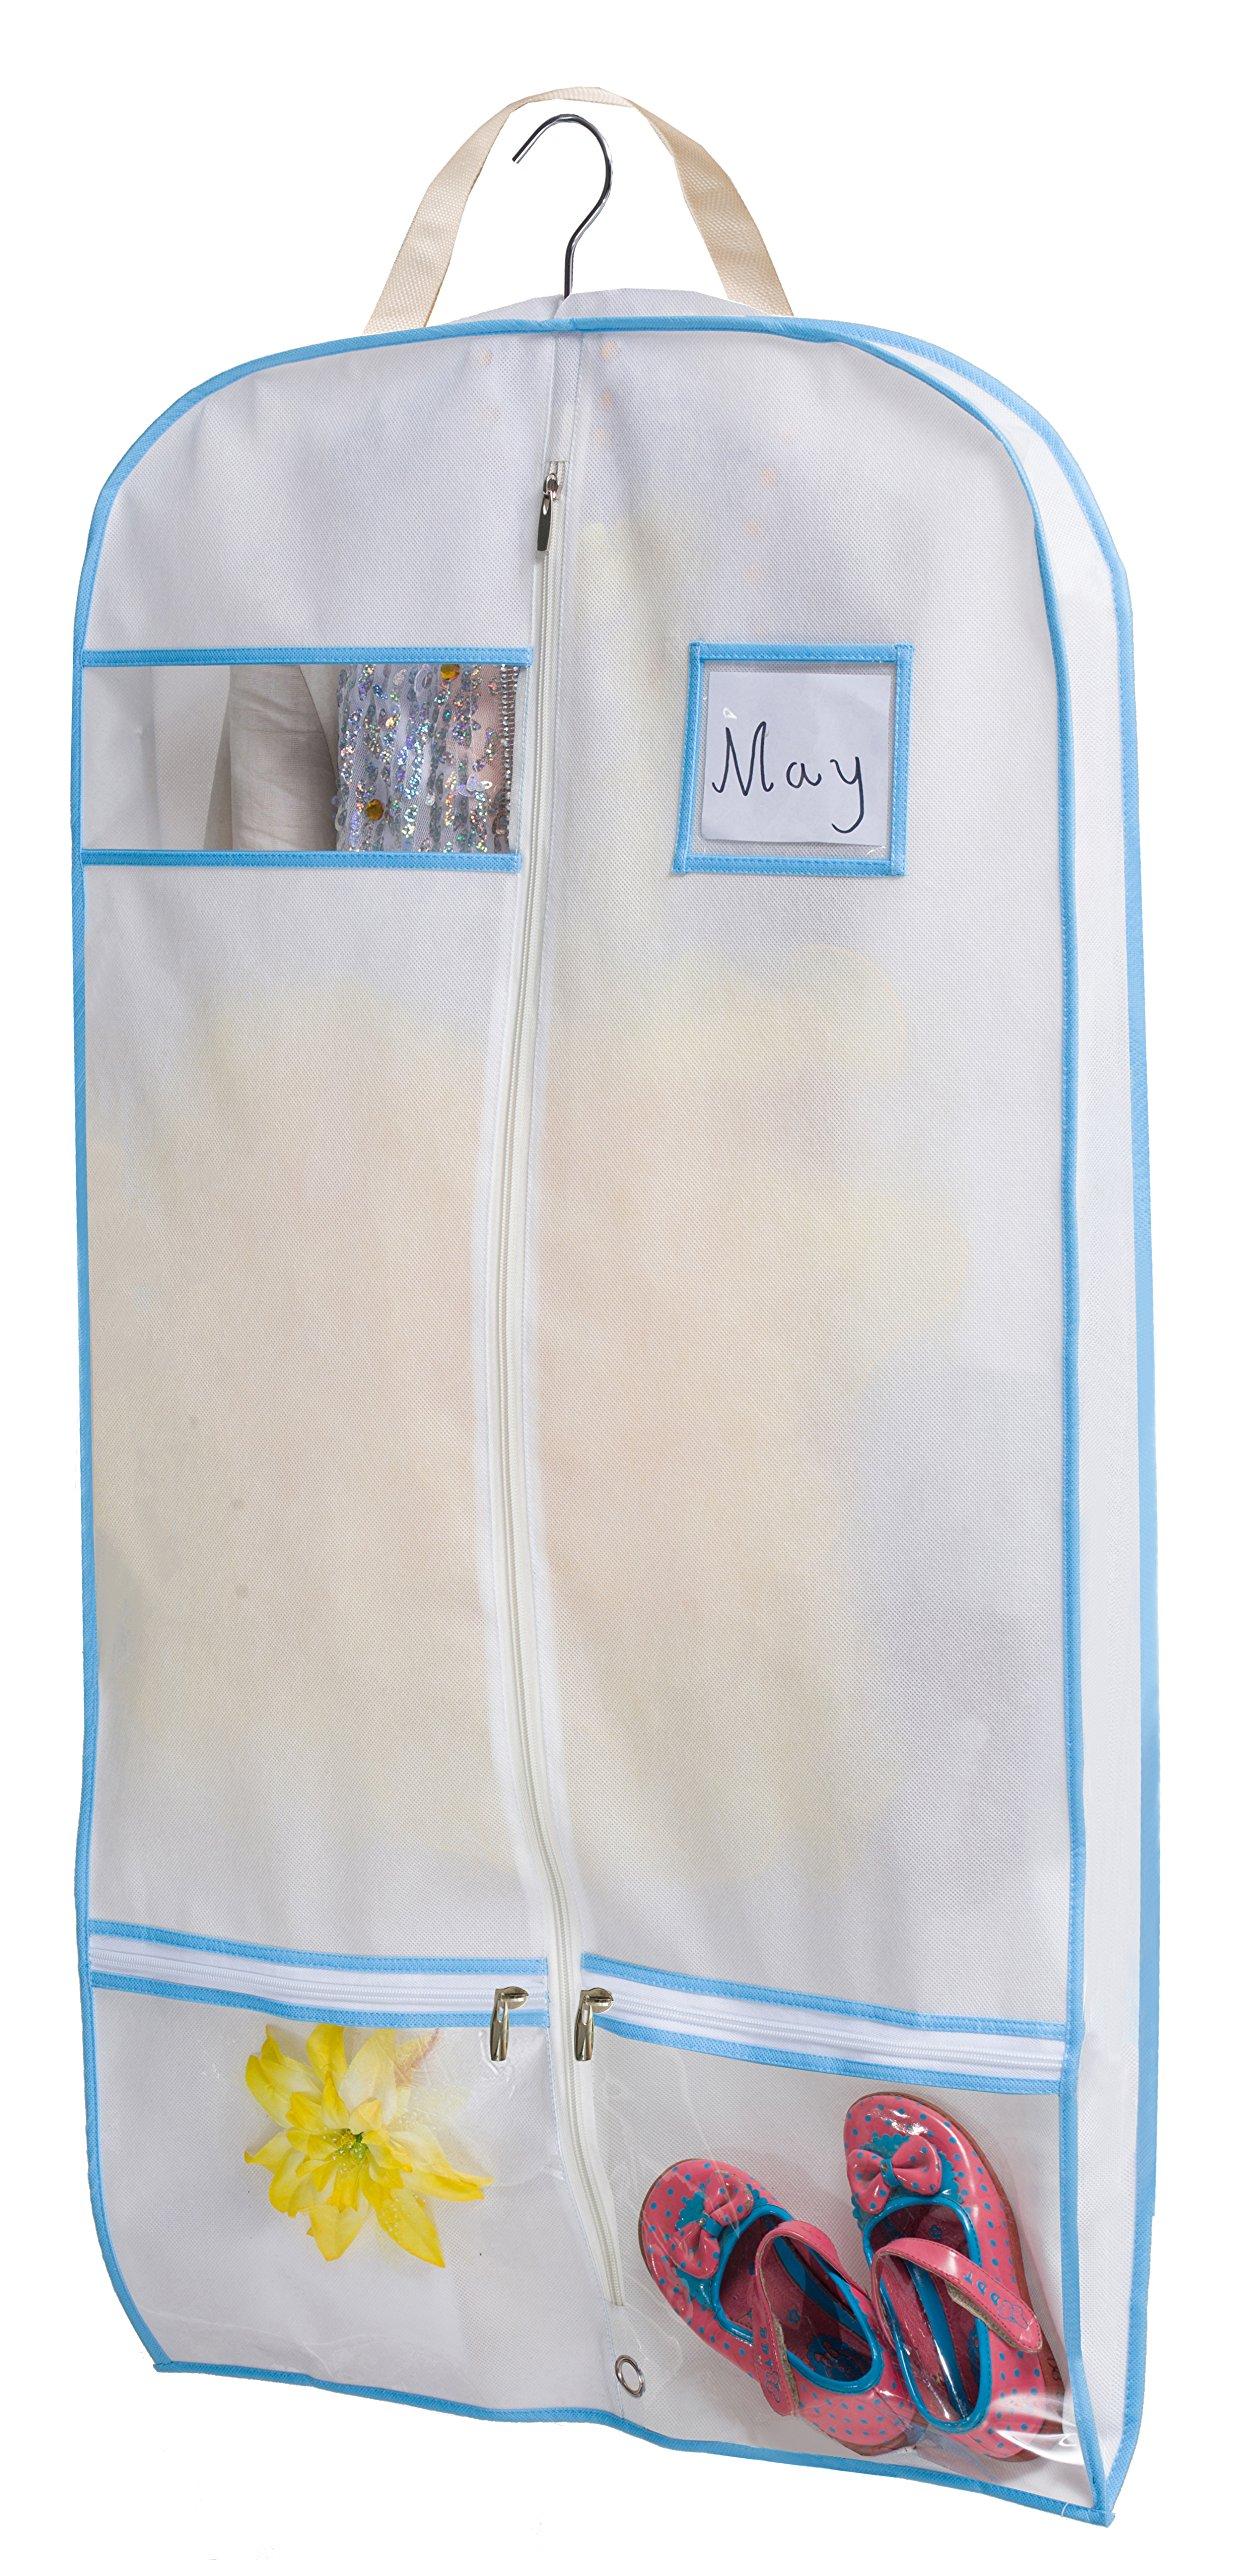 Kimbora 40'' Travel Dance/Dress Costume Garment Bag with Clear Accessories Zipper Pockets Suit Garment Cover (White) by KIMBORA (Image #1)